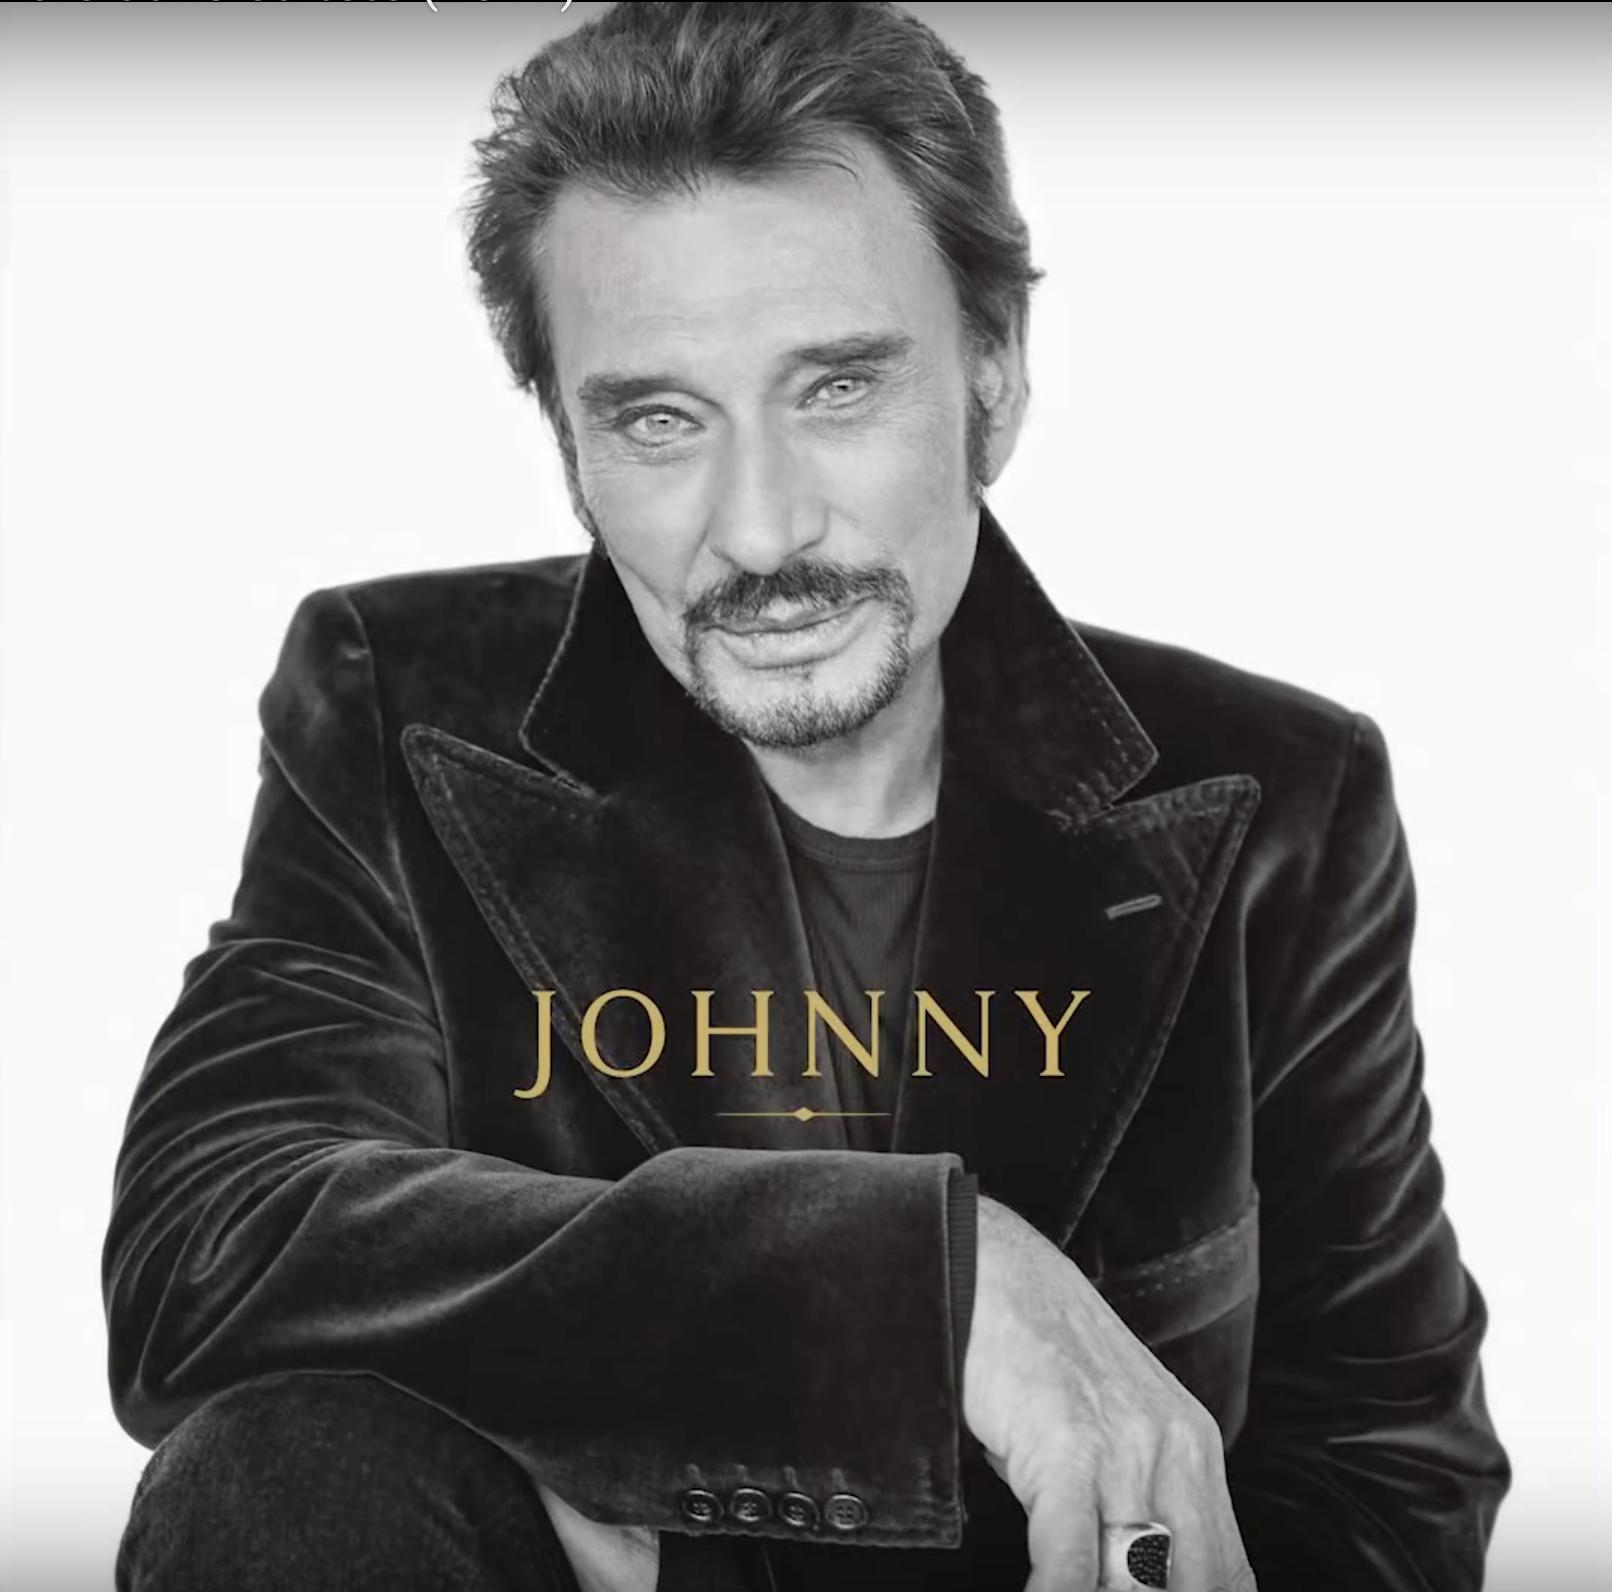 Johnny Hallyday - Johnny - album symphonique - top albums 2019